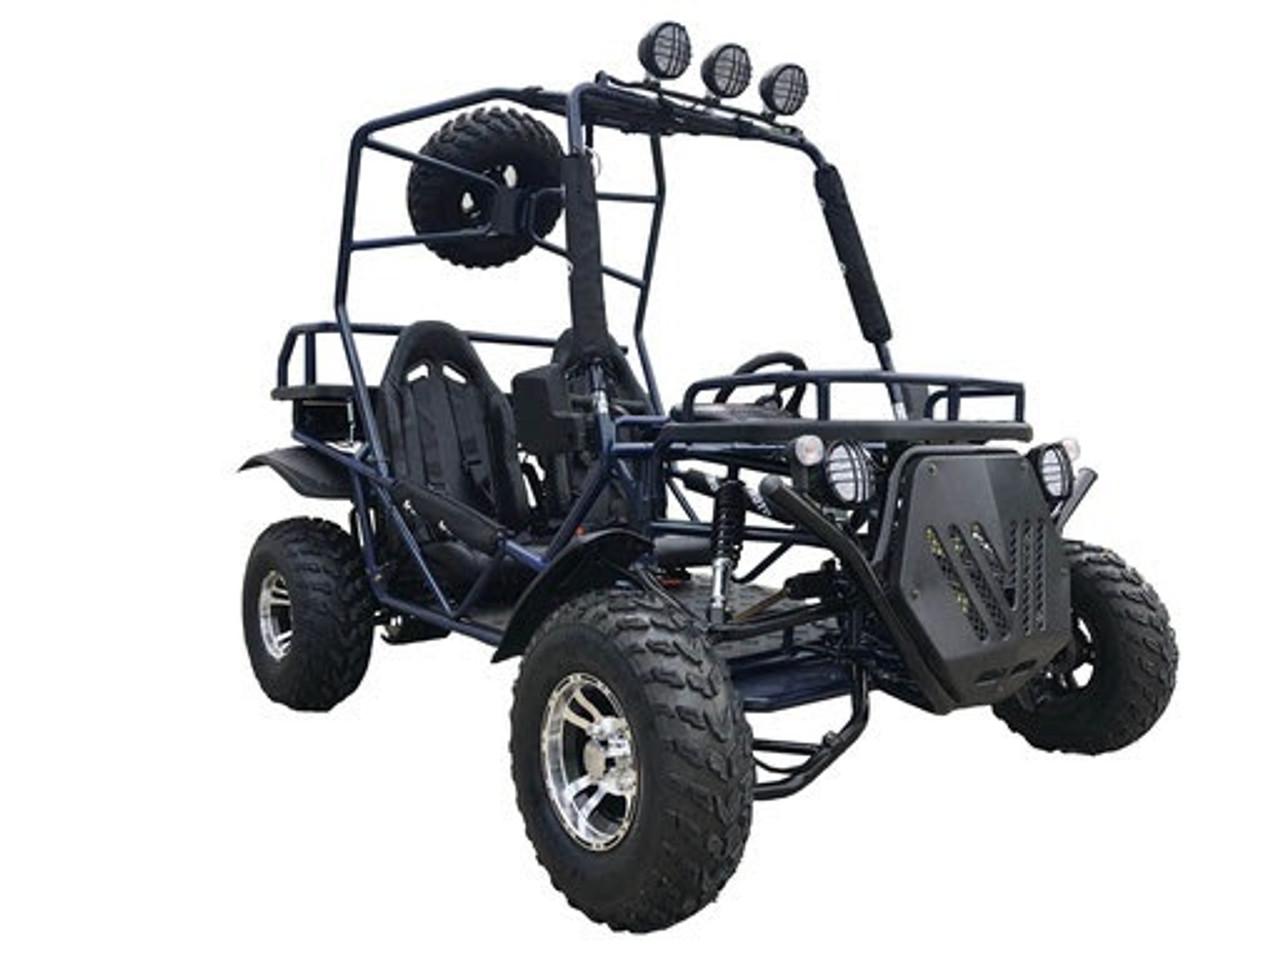 DF-MOTO 200 Go Kart Type G